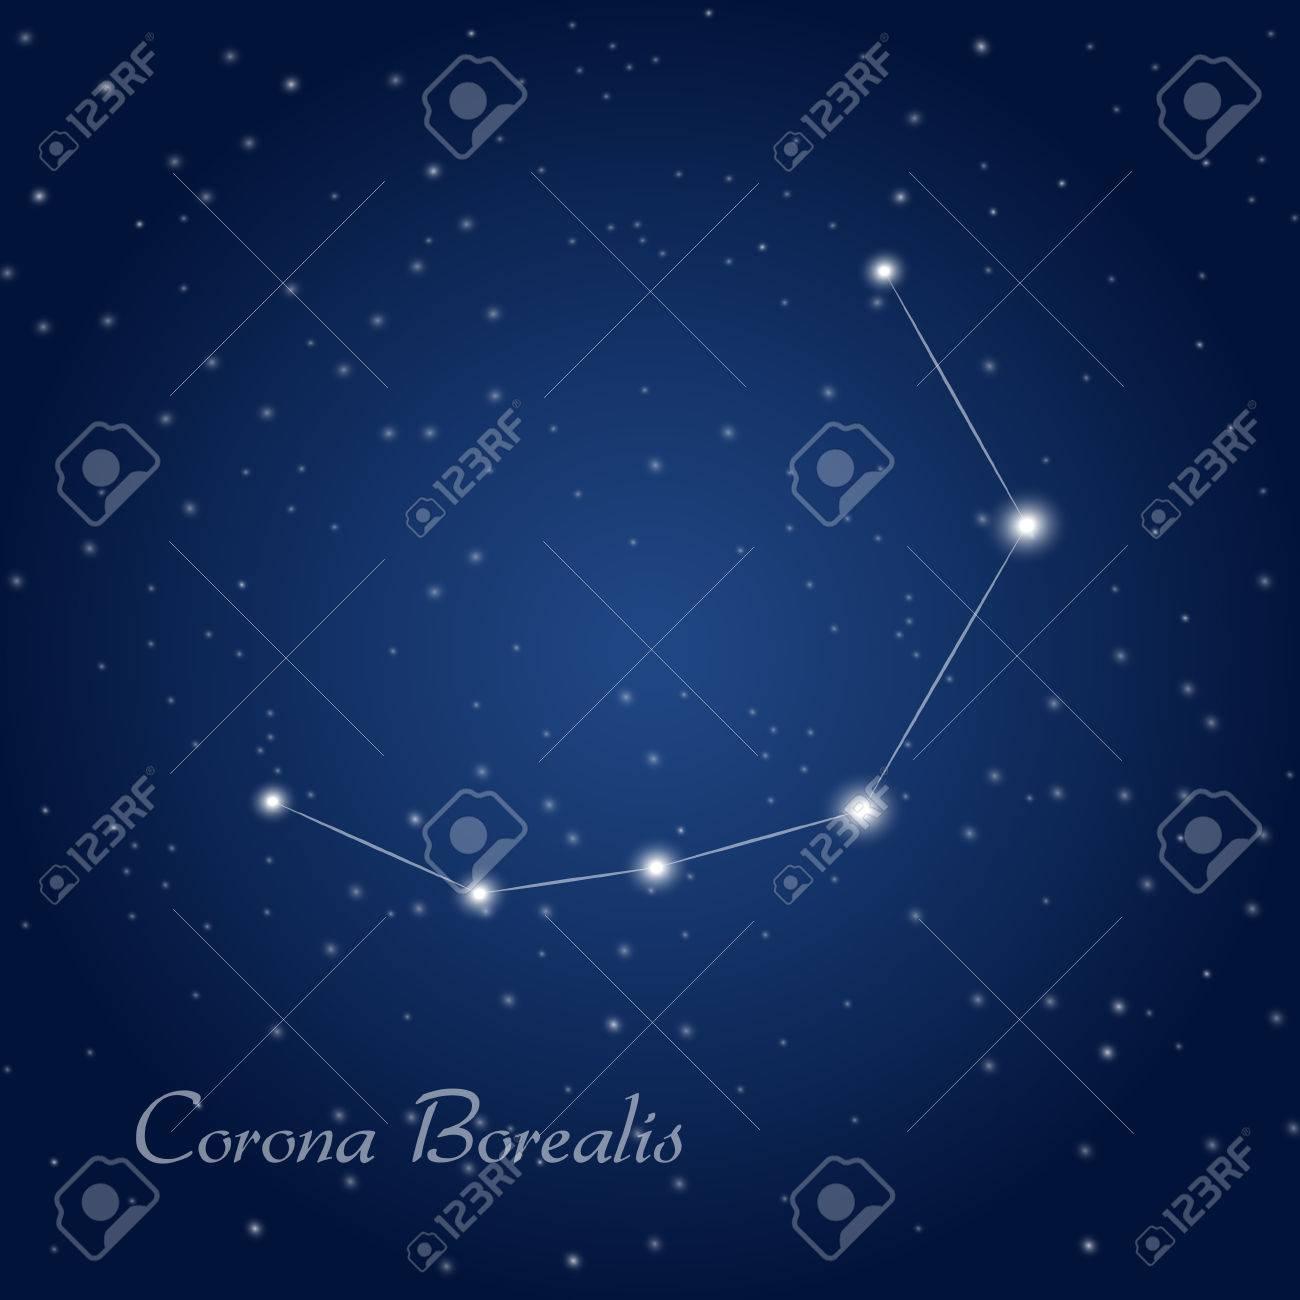 Corona Borealis Constellation At Starry Night Sky Royalty Free Cliparts Vectors And Stock Illustration Image 53438462